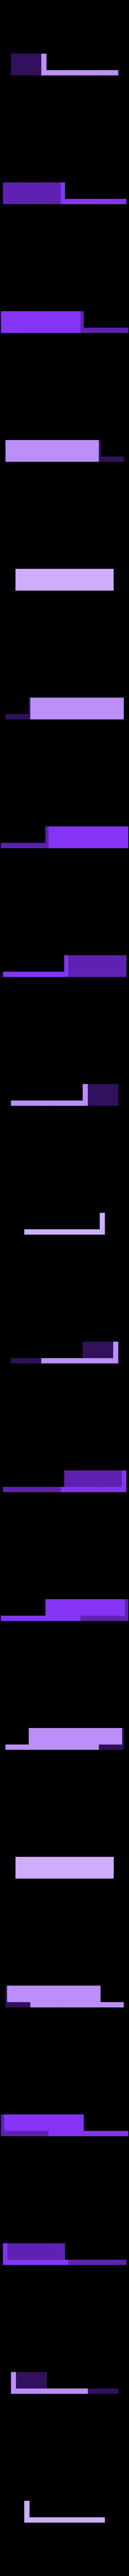 xpi_backwall#r1.stl Download STL file Raspberry Pi 4 case XPI • 3D printing template, Steenberg